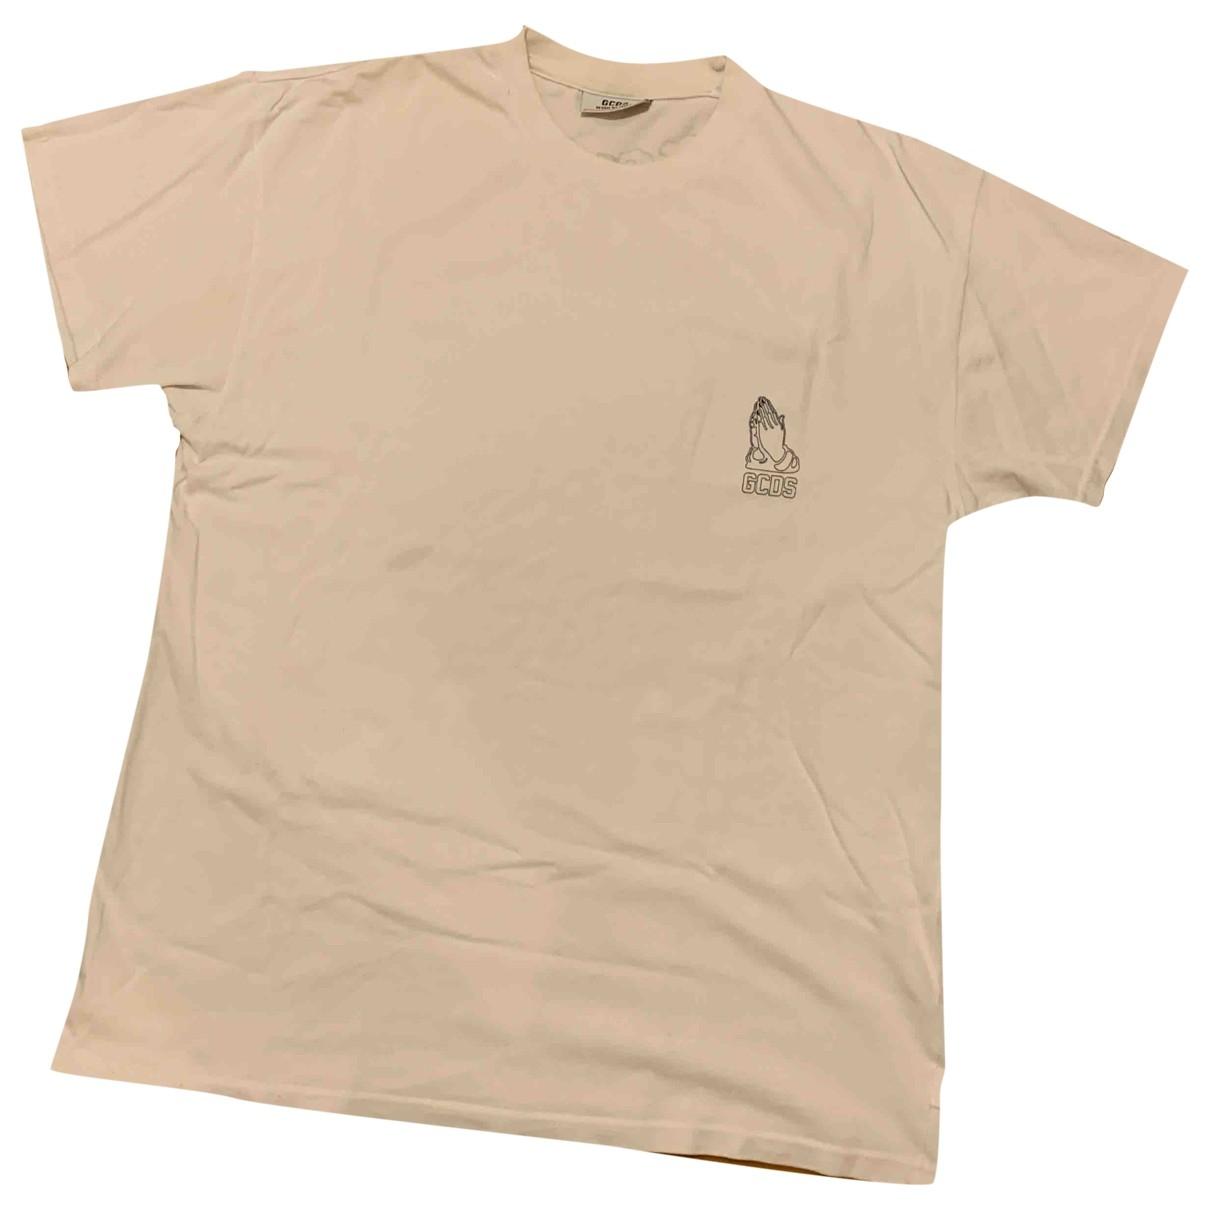 Gcds \N White Cotton T-shirts for Men M International